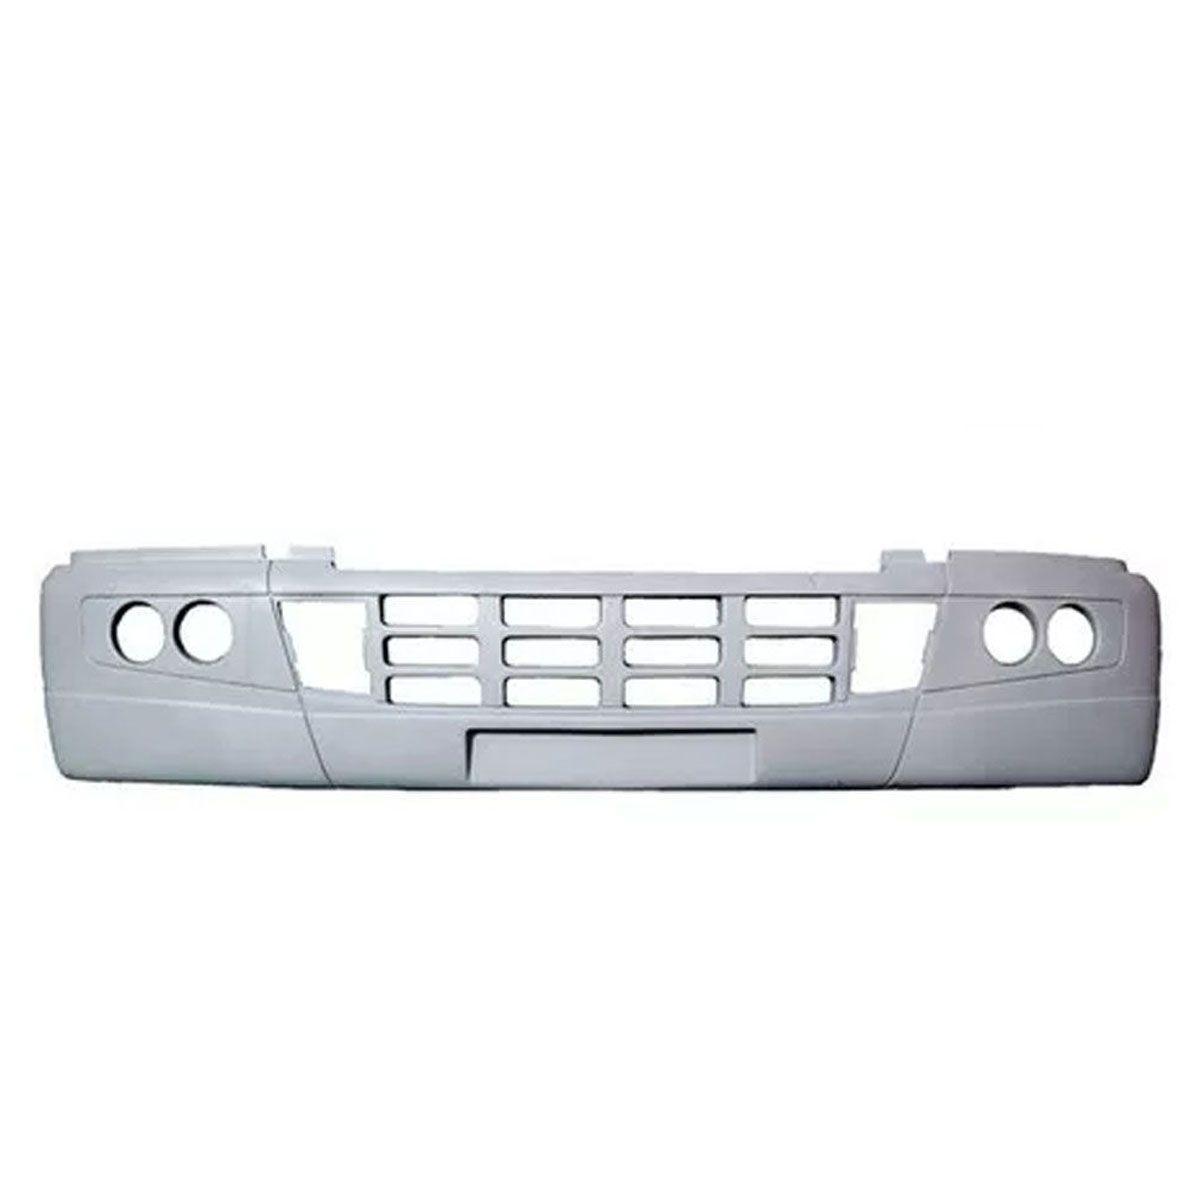 Para-choque para Volvo NH Farol Redondo ( Fibra )